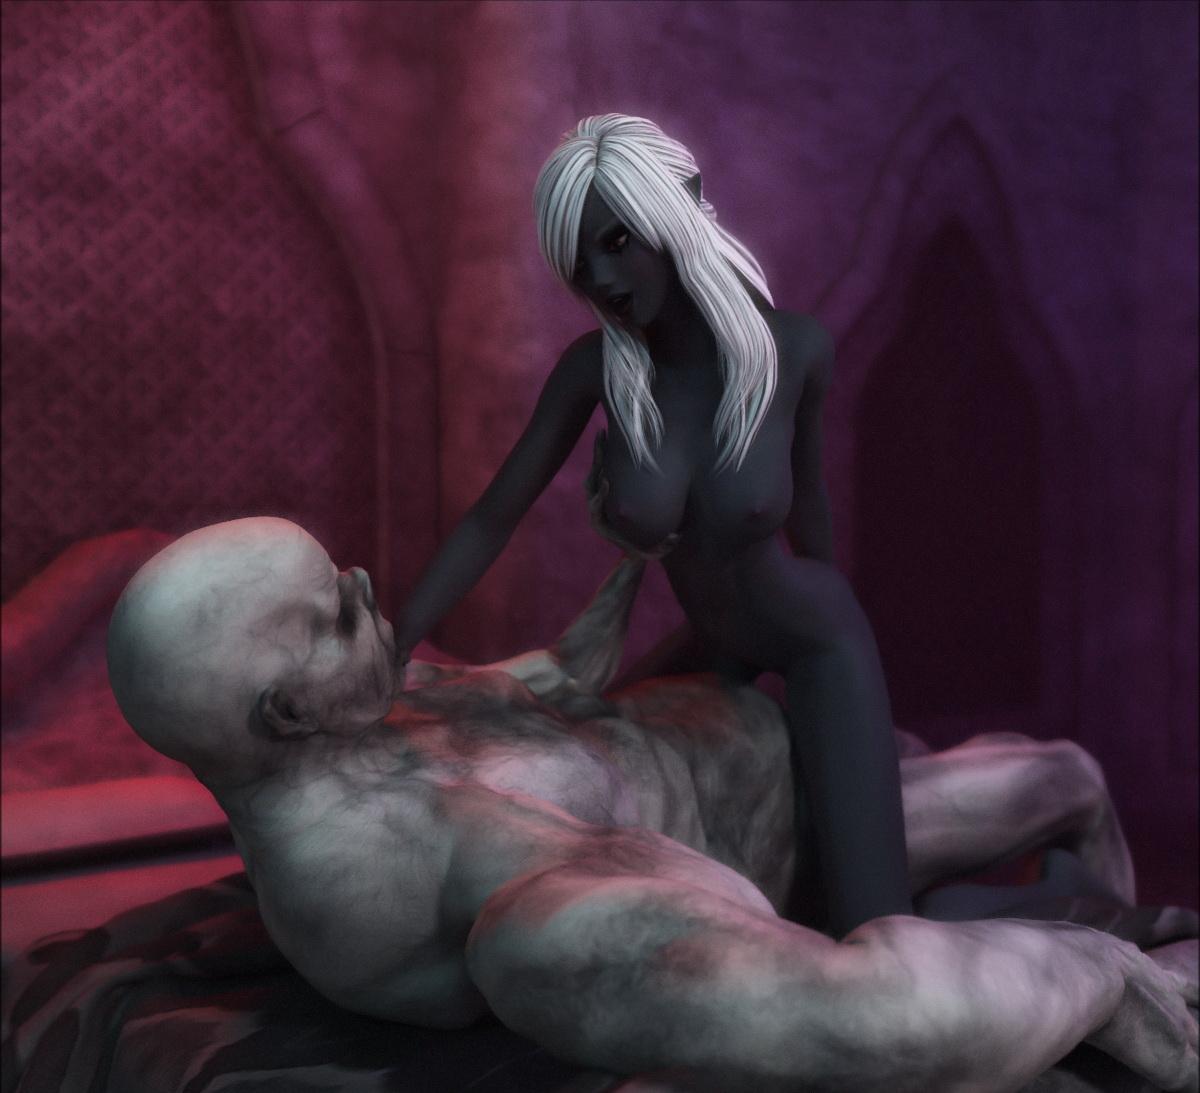 Dark elf vs the king porn exploited thumbs